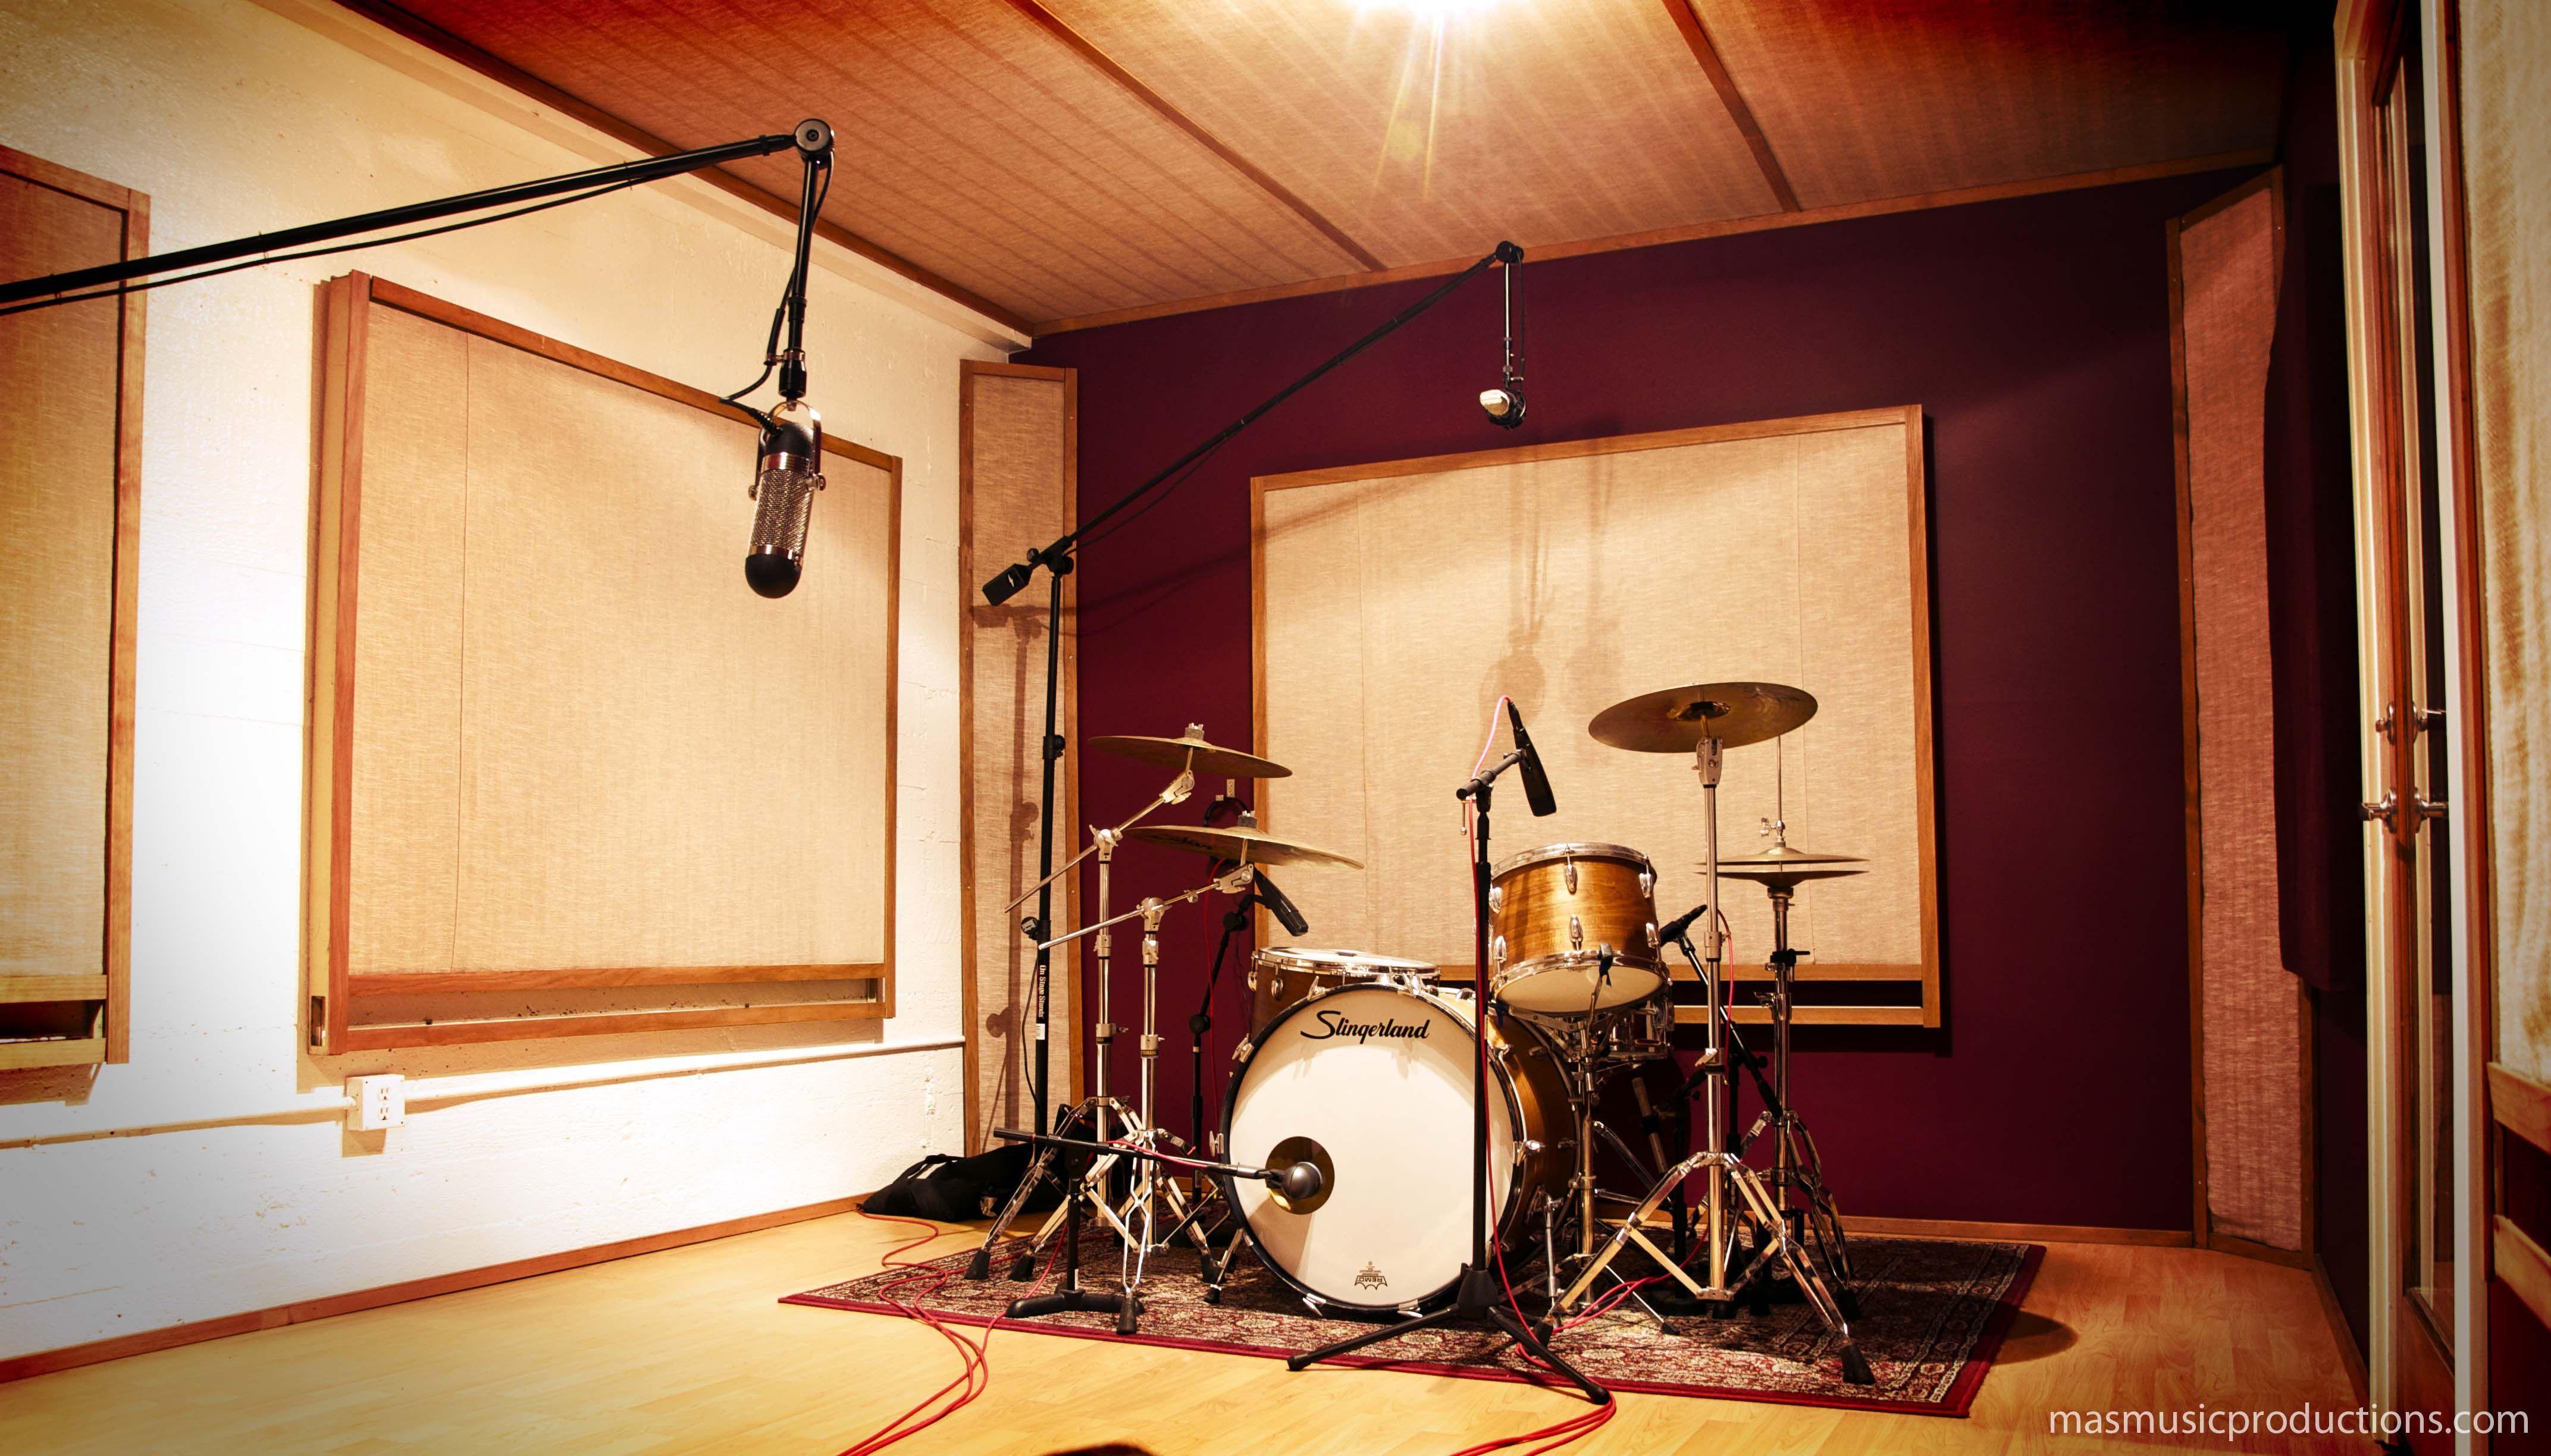 Shipping container music studio joy studio design gallery best - Recording Studio Live Room Drum Tracking Vintage Slingerland